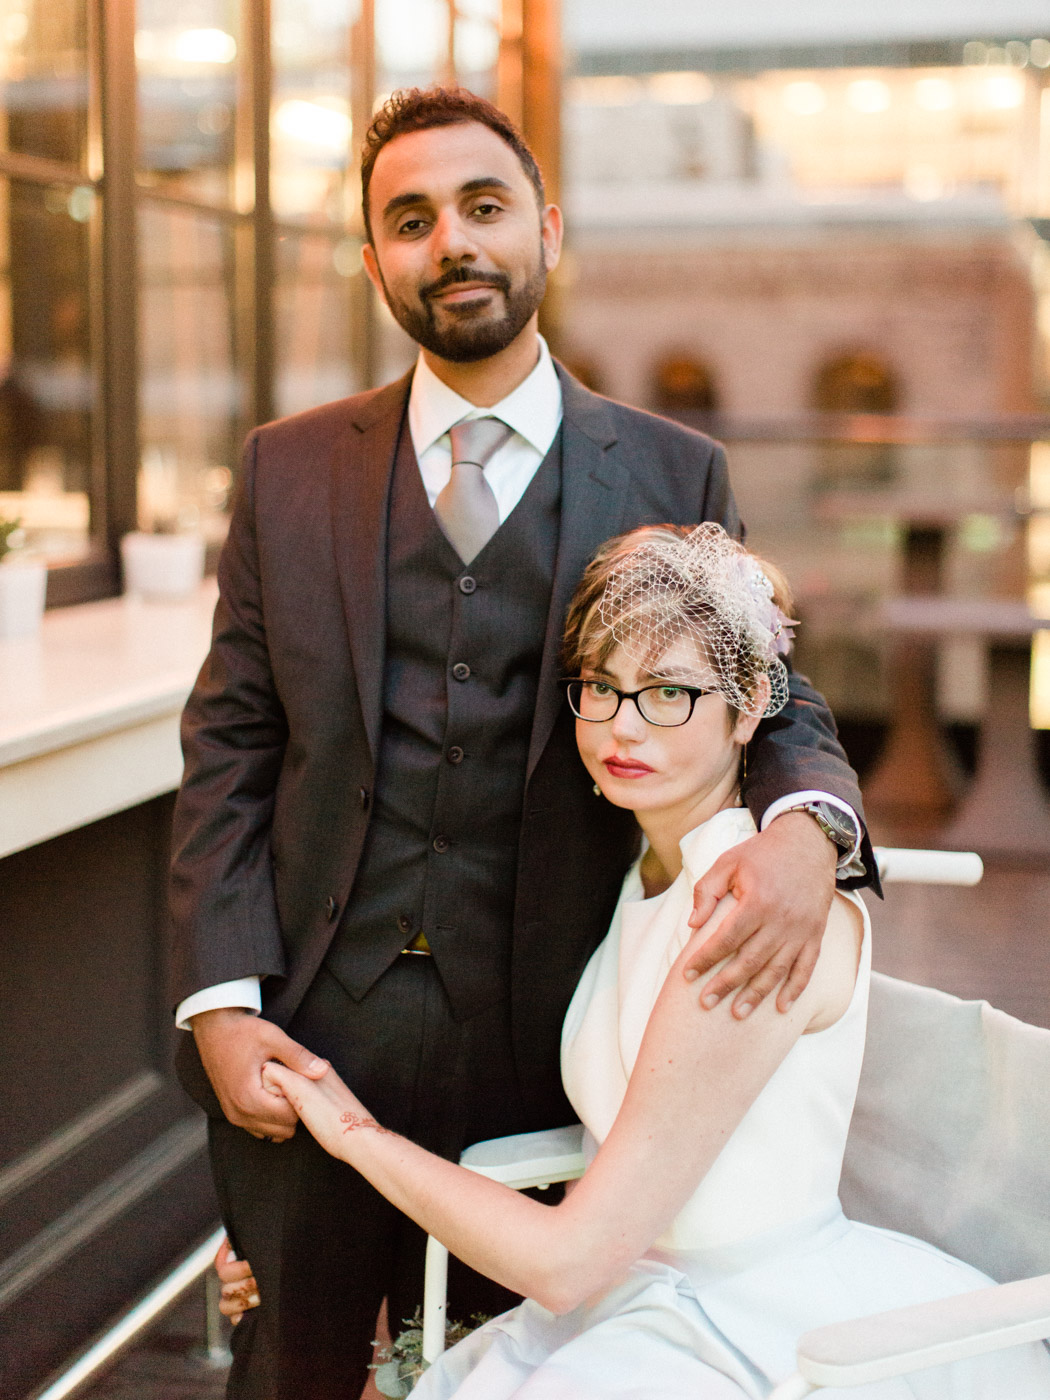 Toronto-wedding-photographer-intimate-restaurant-elopement-chase-oyster-downtown60.jpg